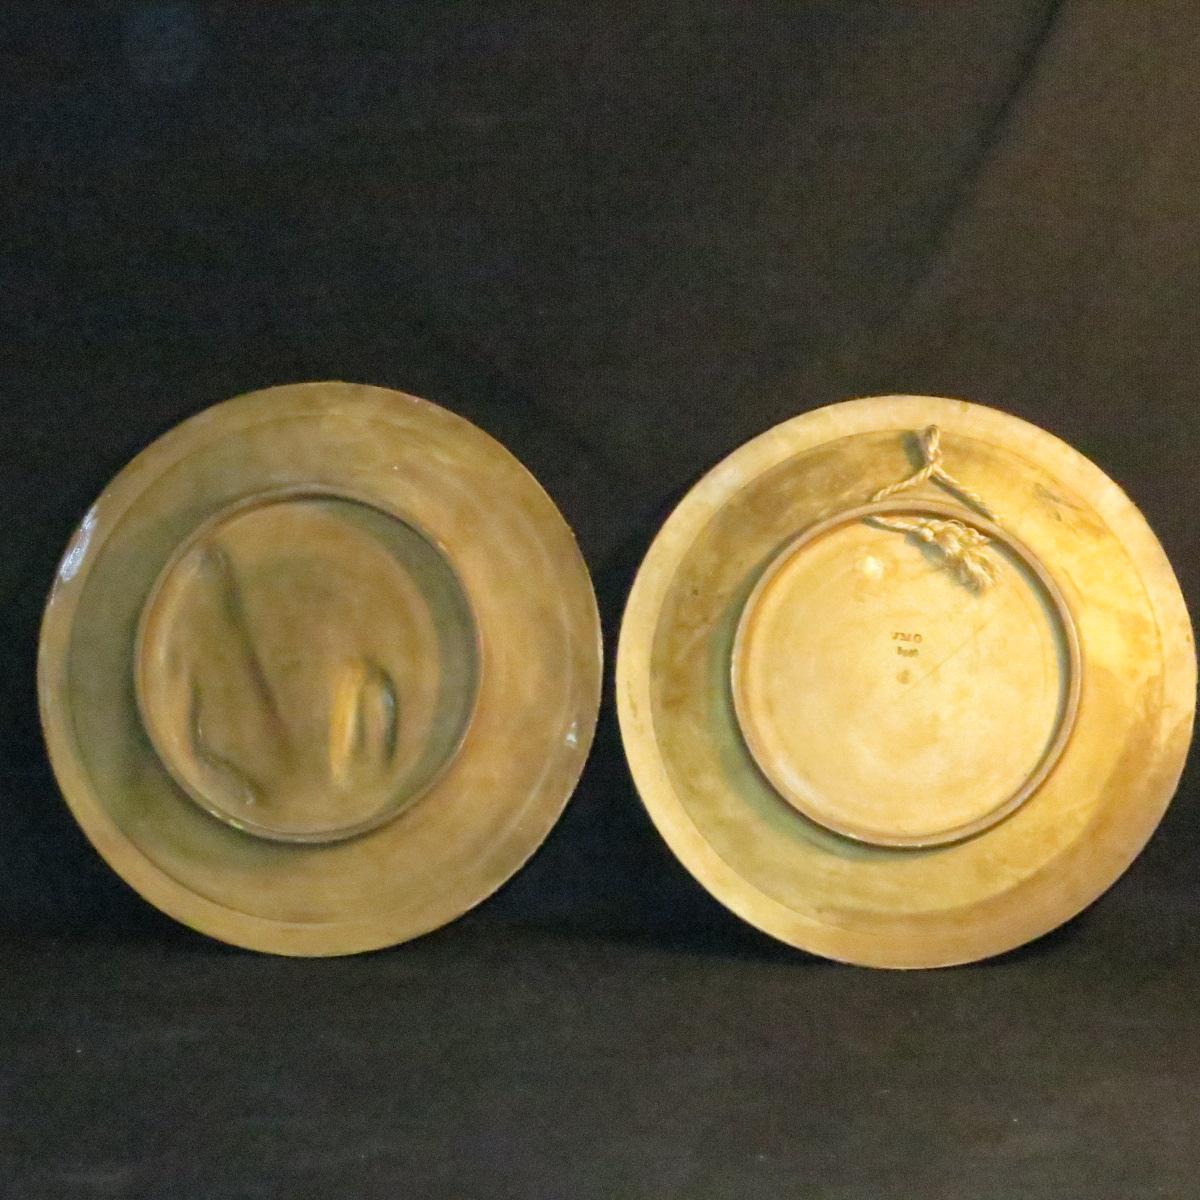 Johann Maresch Pair Of Plates Plates Pottery Central European Gypsies-photo-6